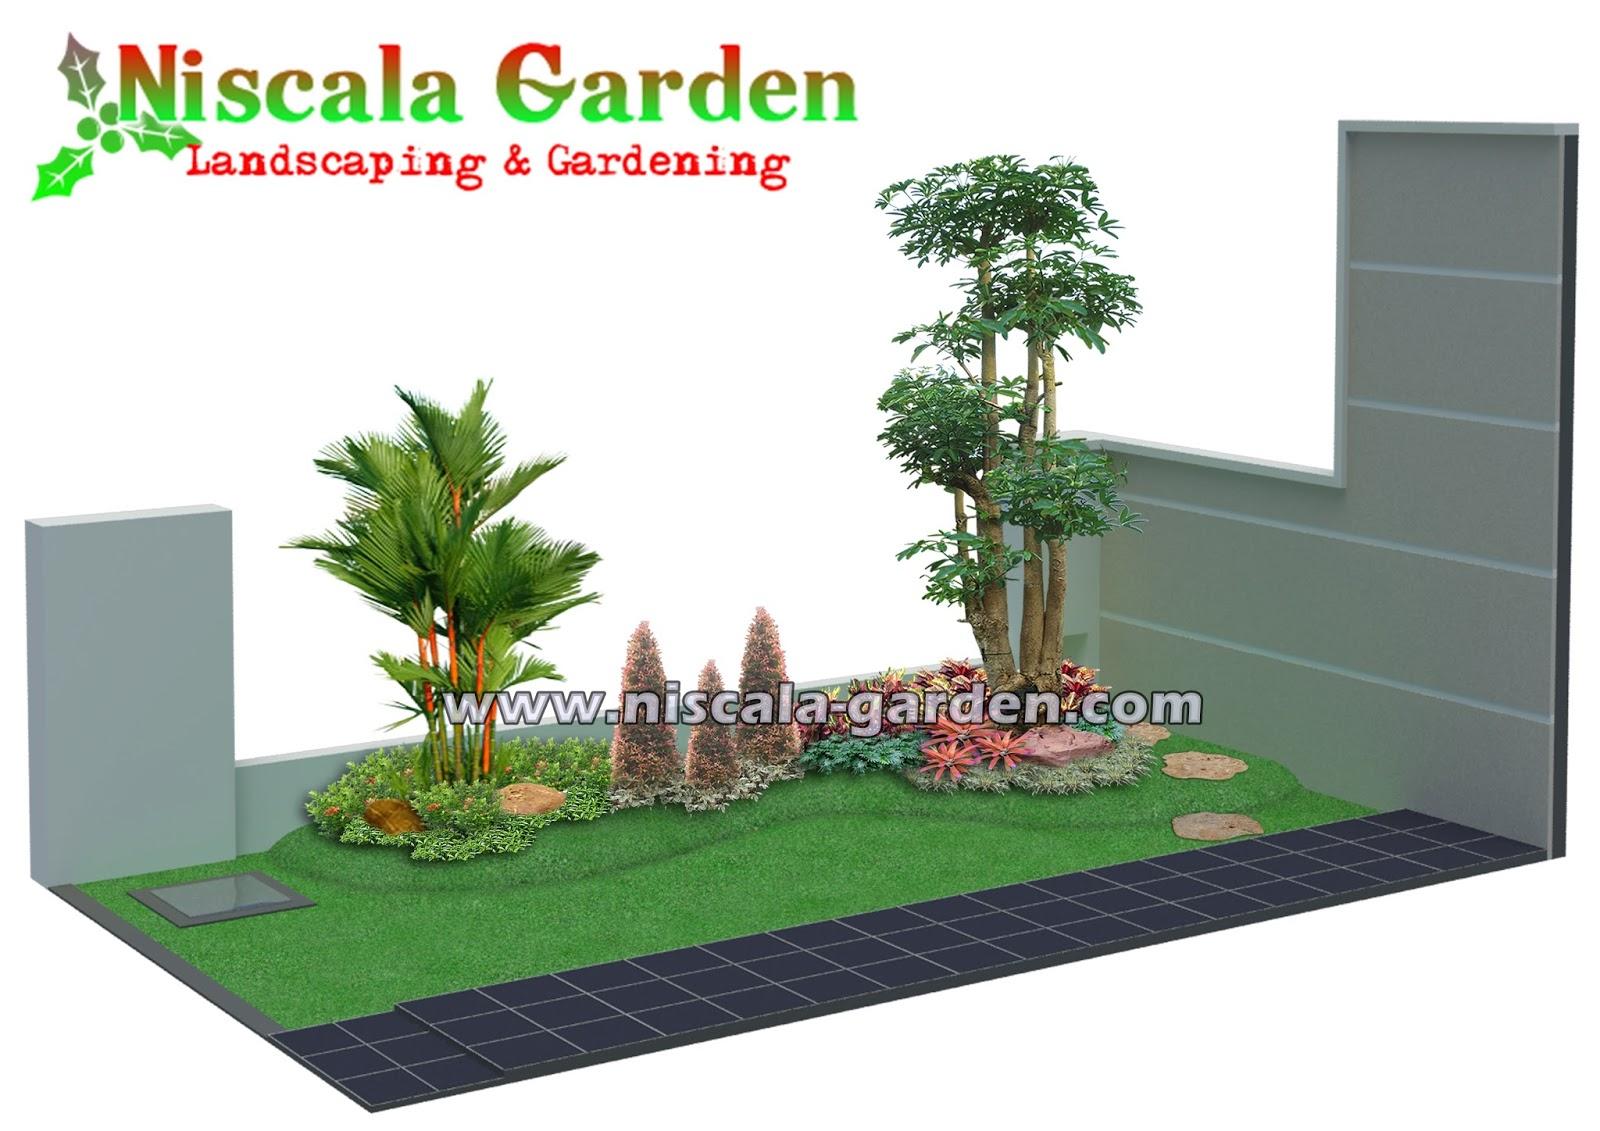 45 Desain Taman Tropis Modern NISCALA GARDEN Tukang Taman Surabaya